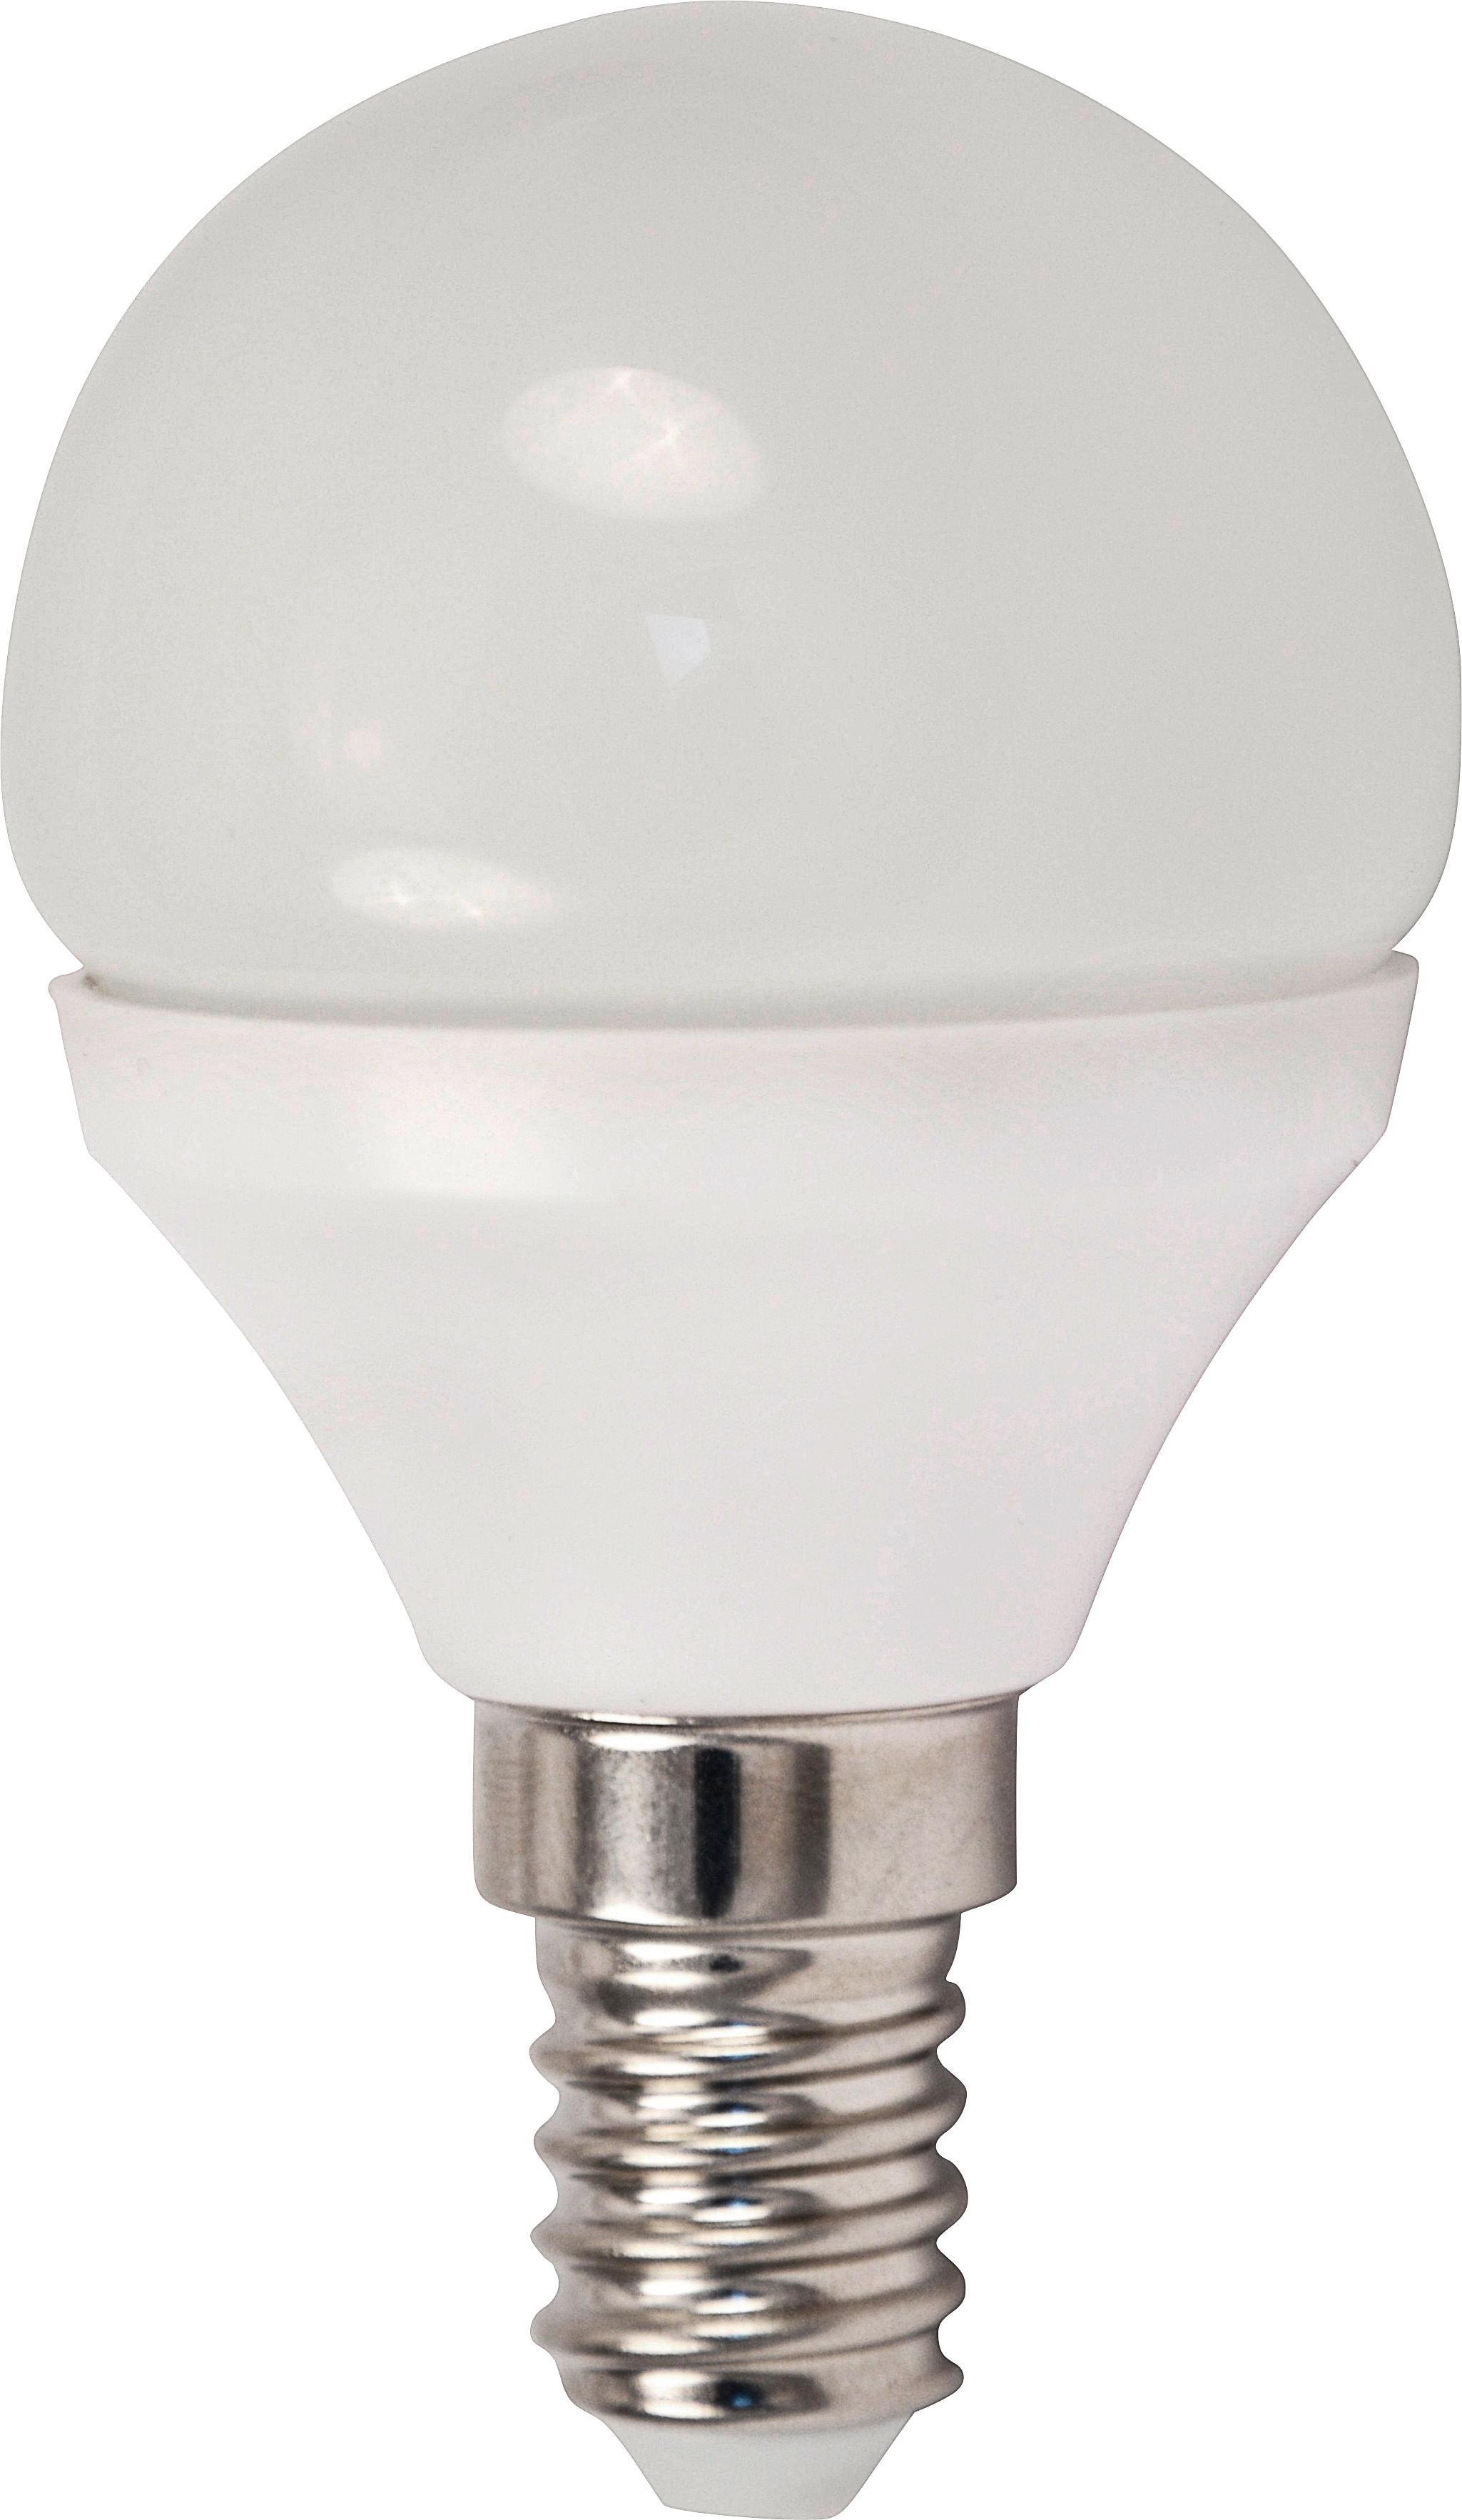 Leuchtmittel C80194 - Weiß, Keramik/Kunststoff (4,5/7,9cm) - MÖMAX modern living